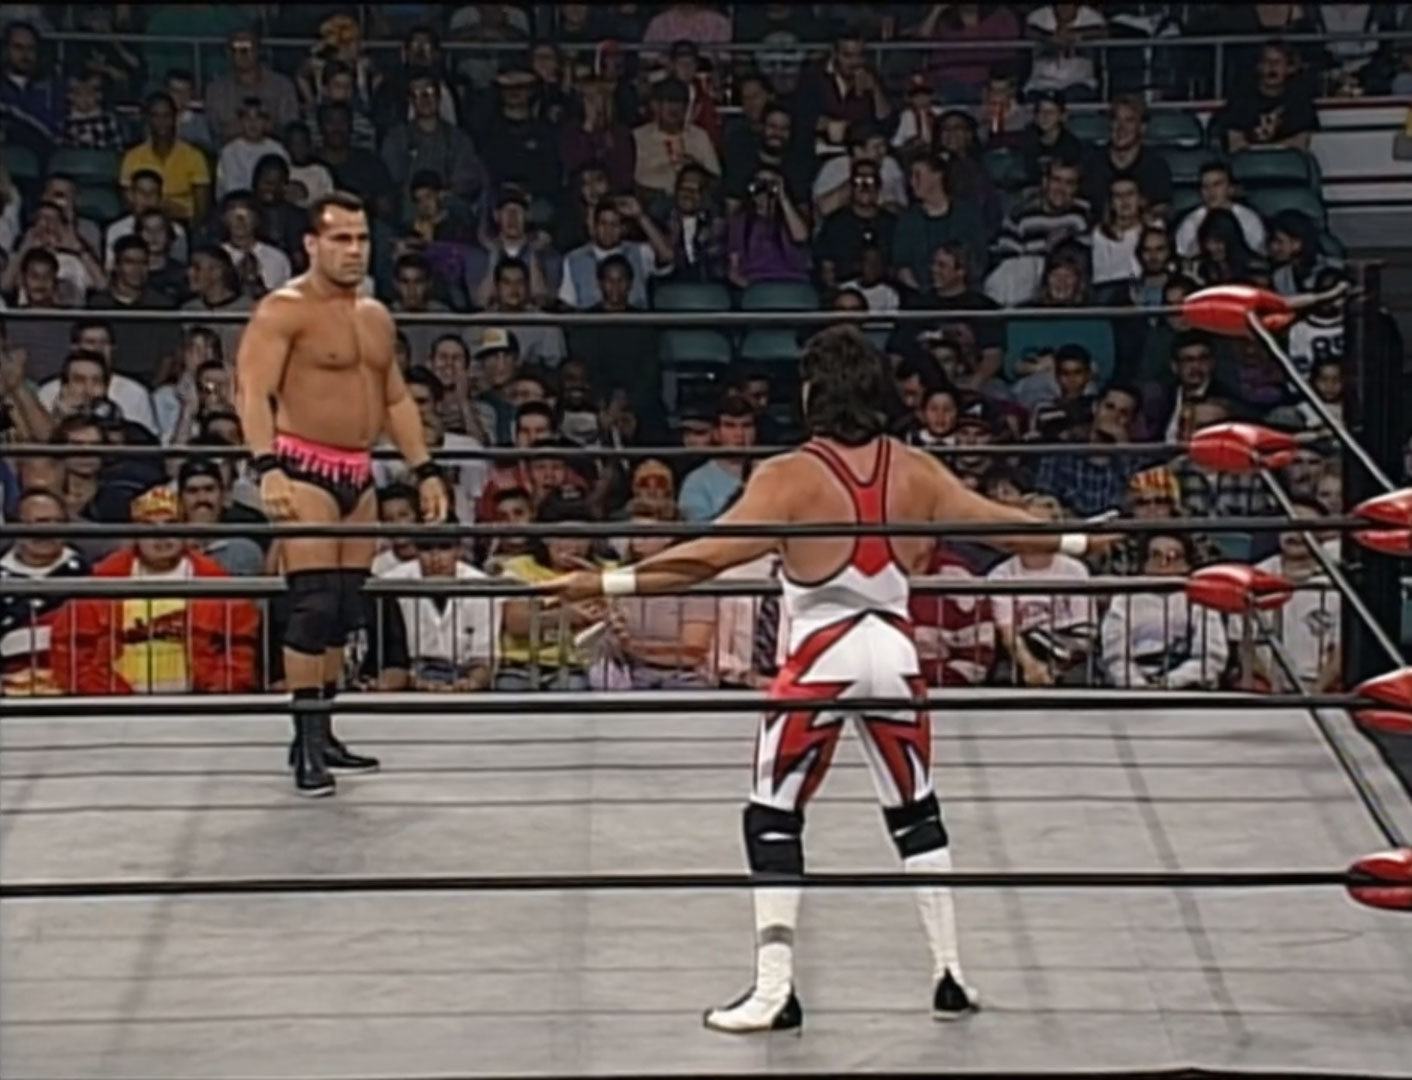 Eddie Guerrero vs. Dean Malenko WCW Monday NITRO, October 2nd 1995